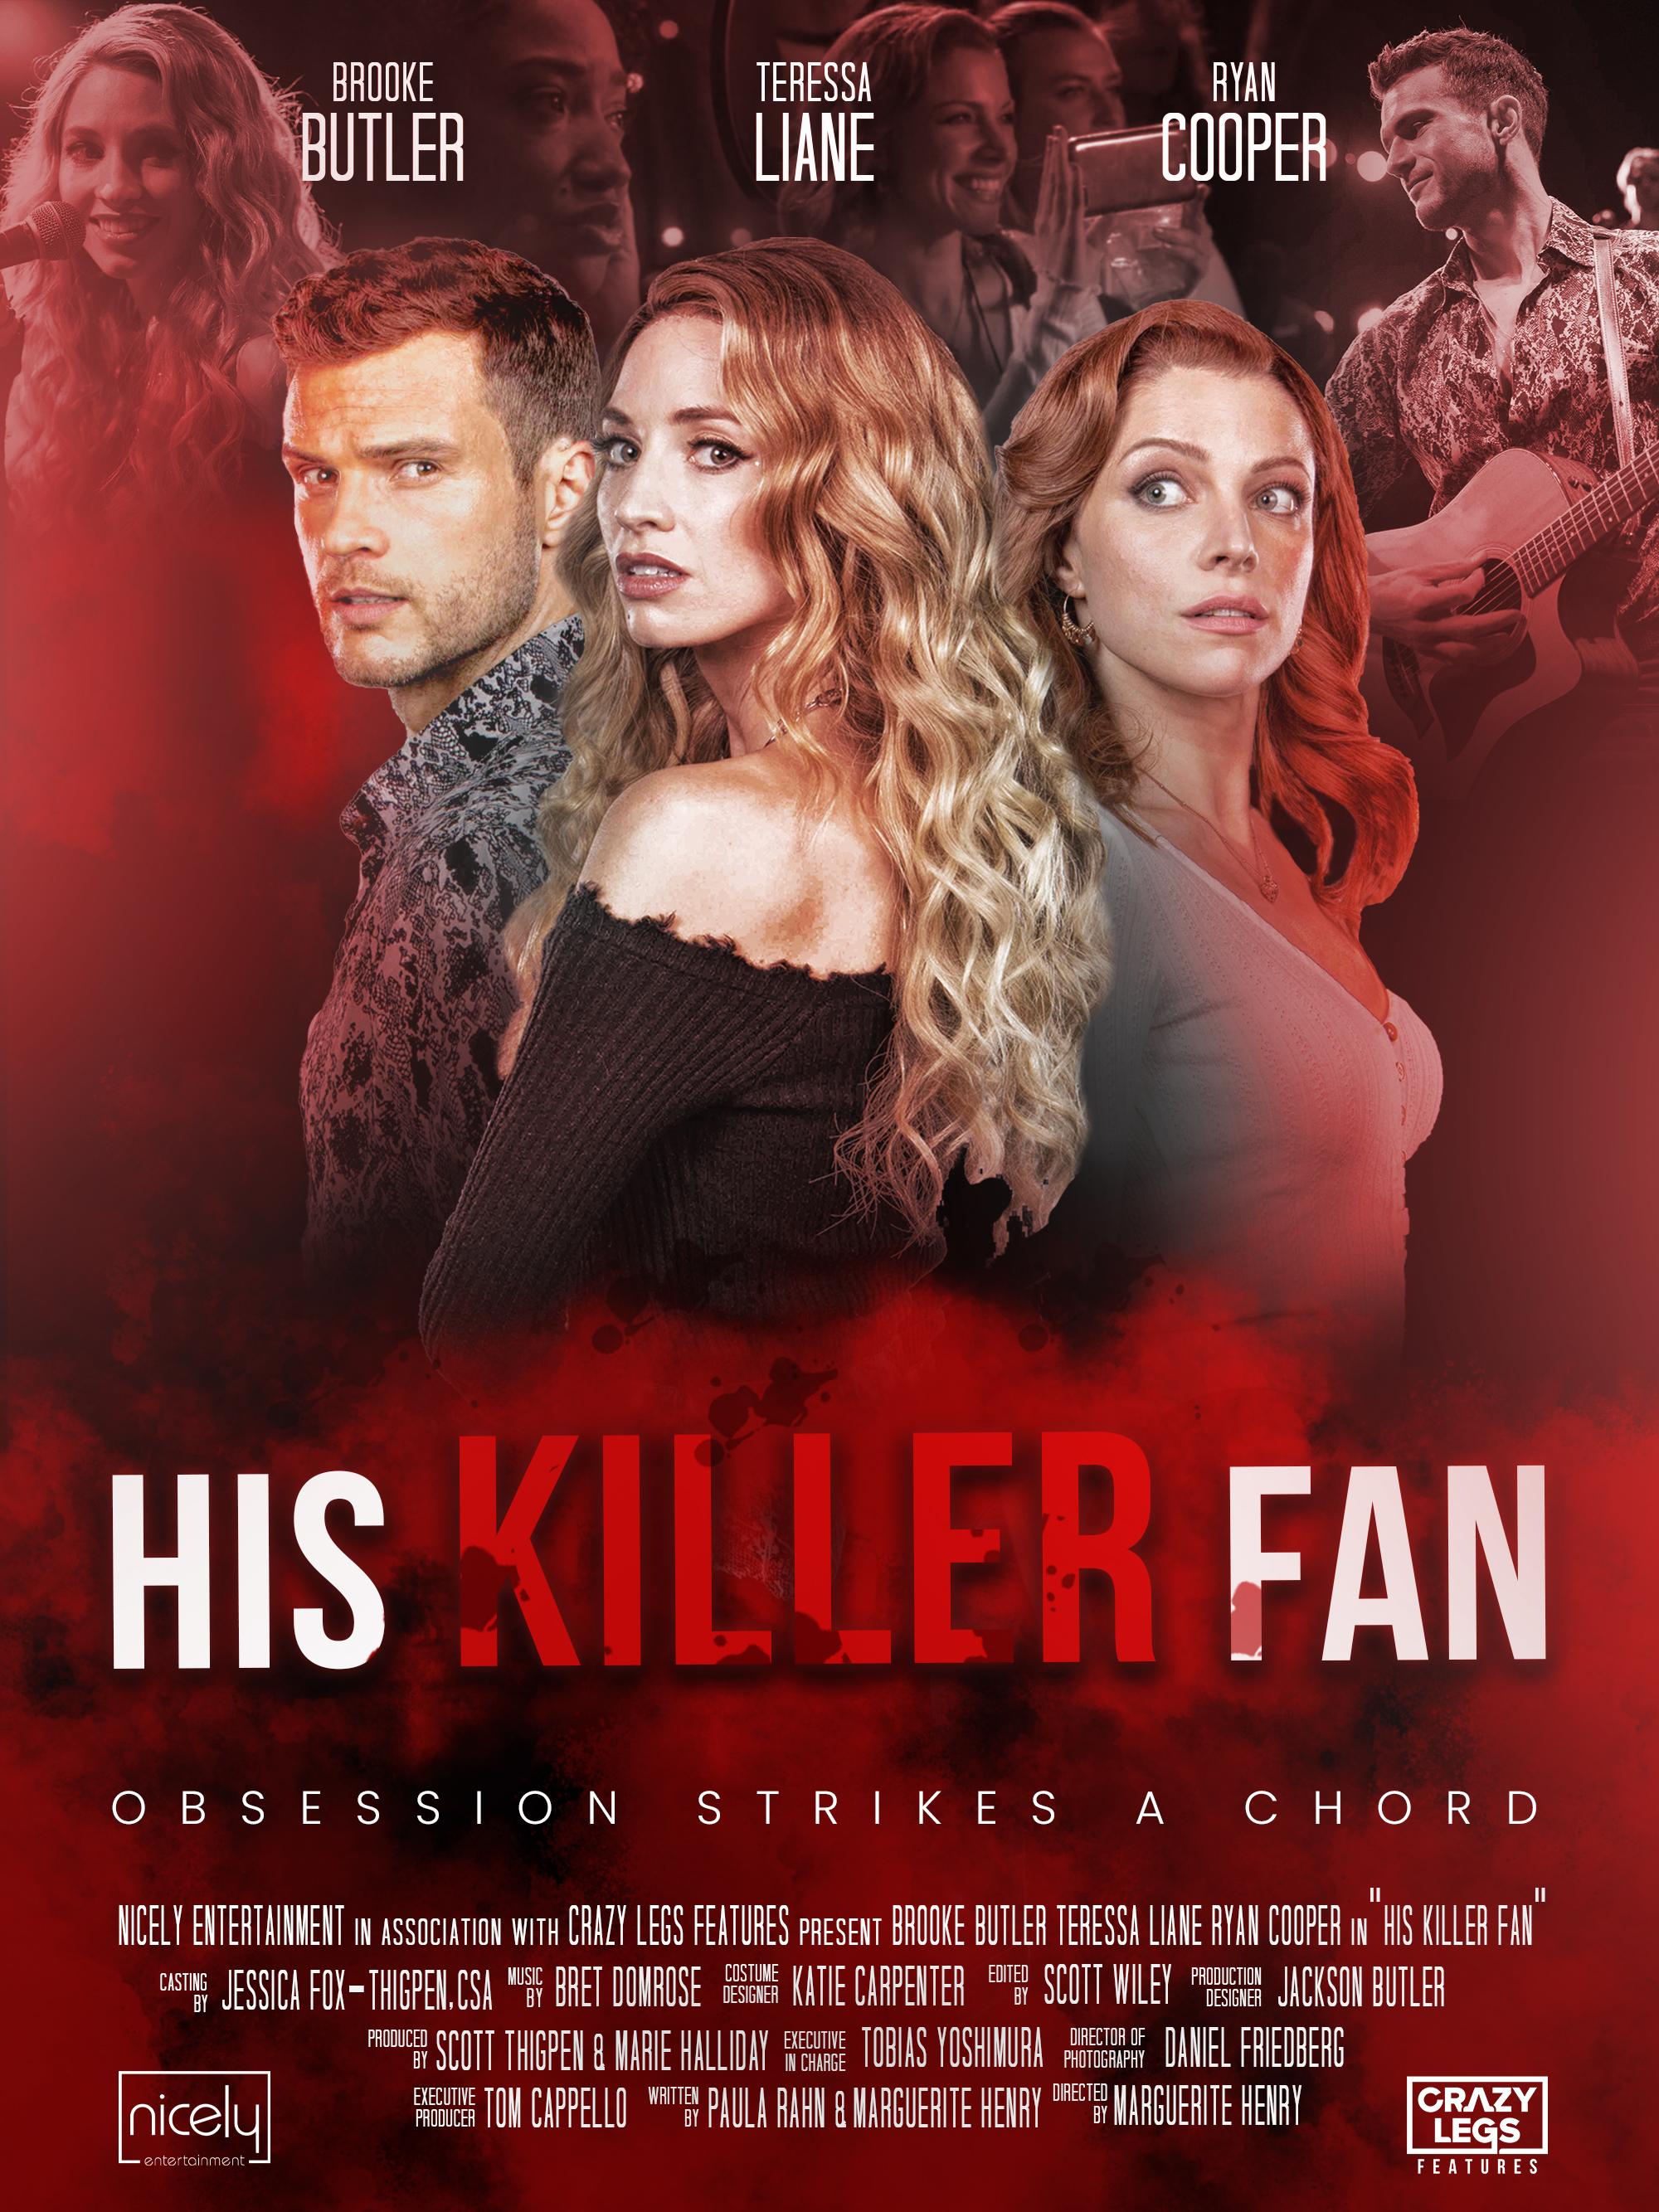 Download His Killer Fan (2021) WebRip 720p Full Movie [In English] With Hindi Subtitles FREE on 1XCinema.com & KatMovieHD.io